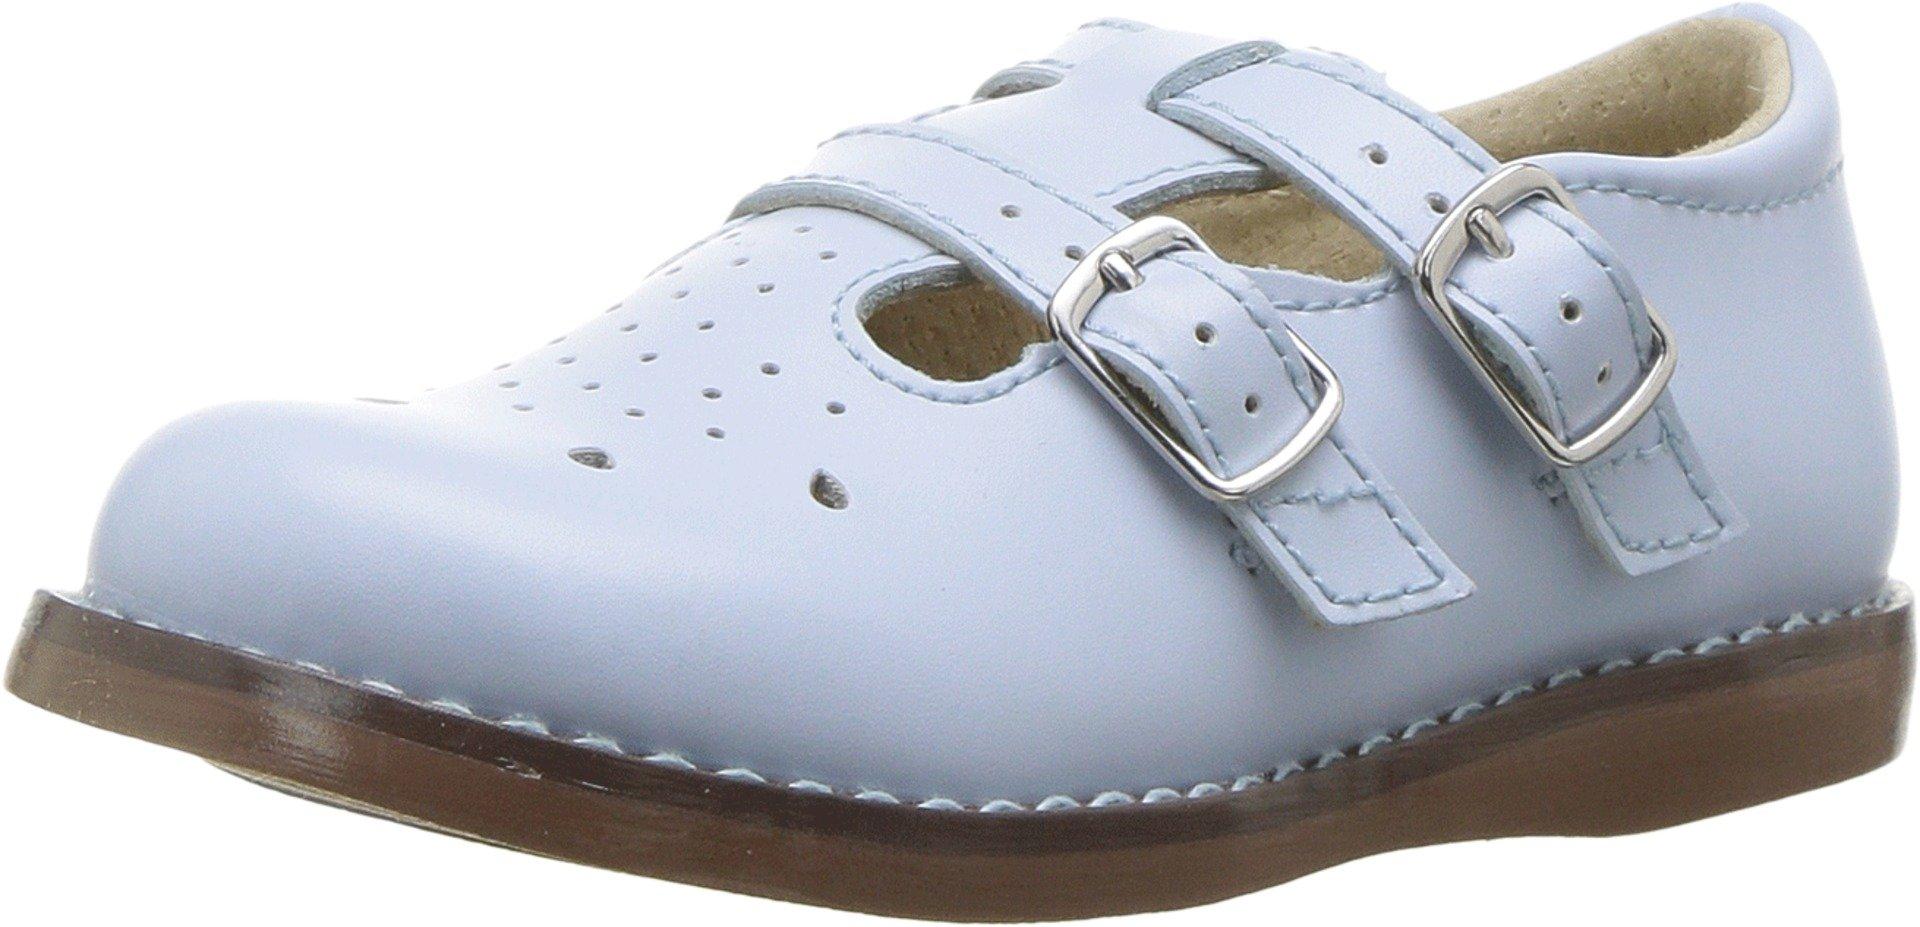 FootMates Girl's Danielle English Sandal Light Blue - 2214/10.5 Little Kid M/W by FootMates